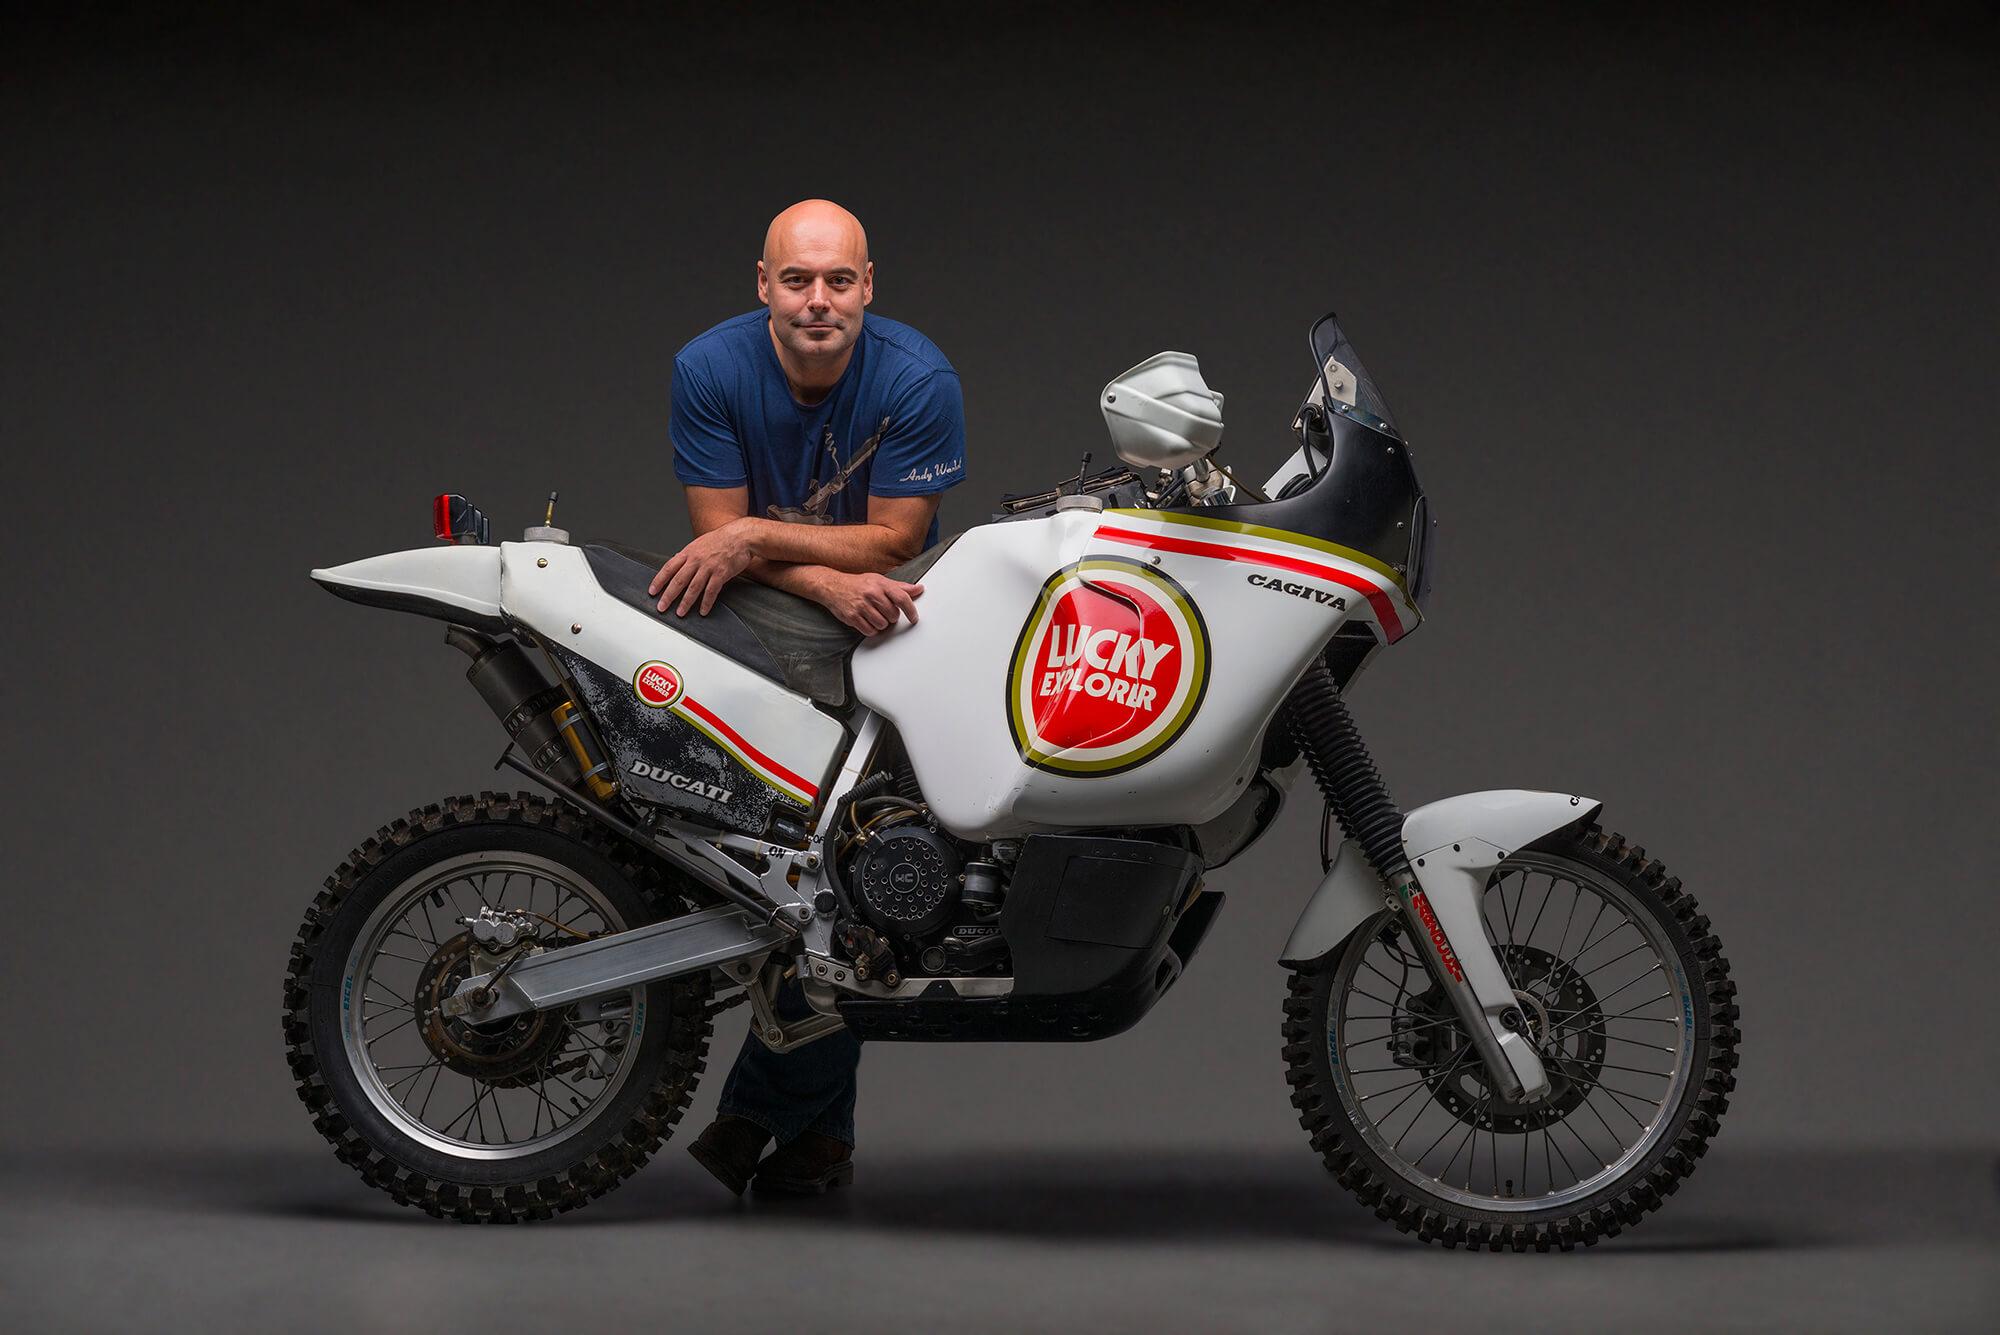 Bike Collector Paris Dakar Bike